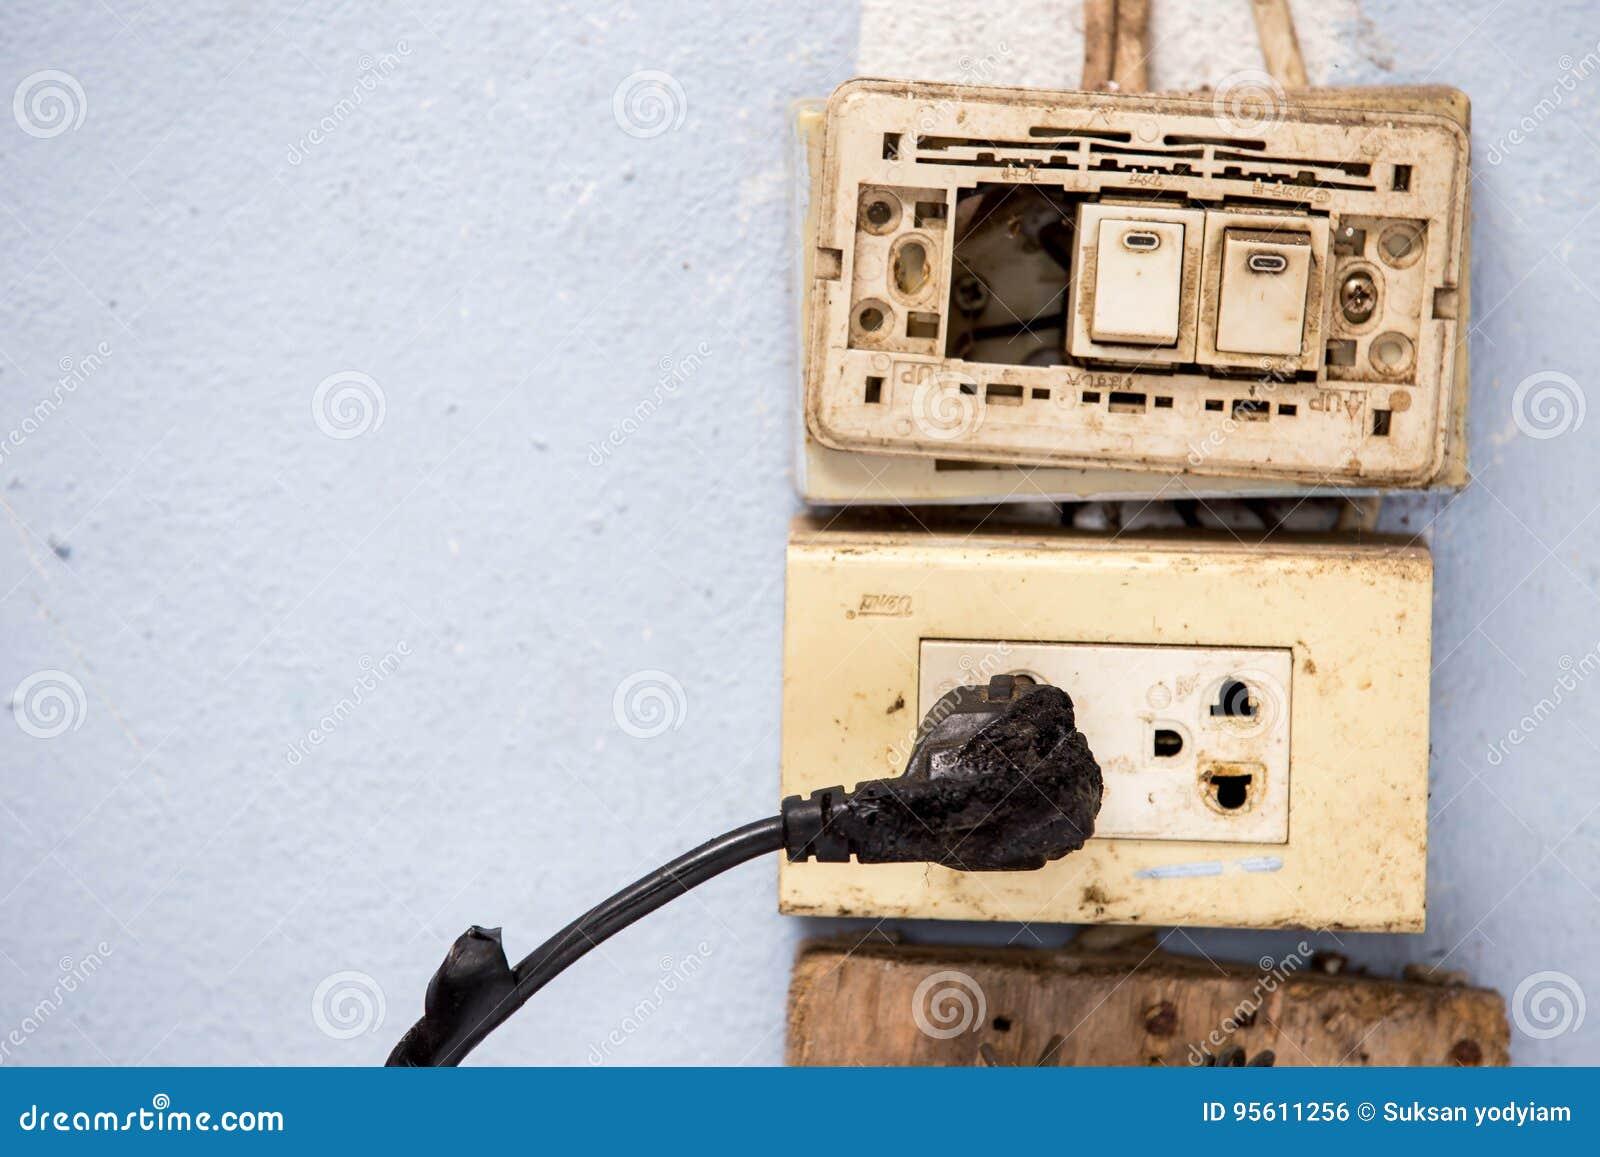 Electricity short circuit